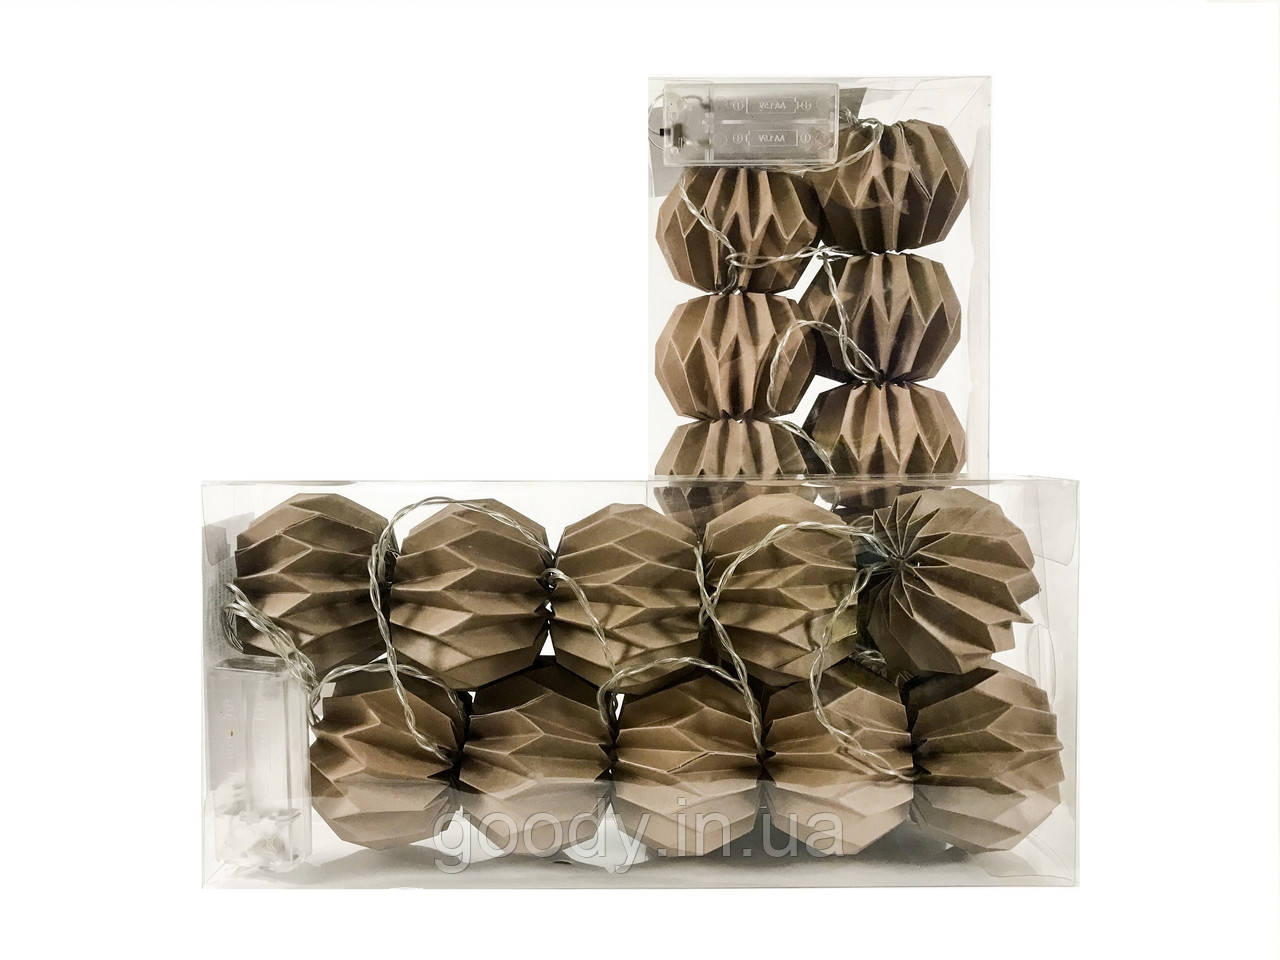 Гірлянда Decorino Capuccino Paper Balls 10led, діам 7.5см, довжина 235см на батарейках АА